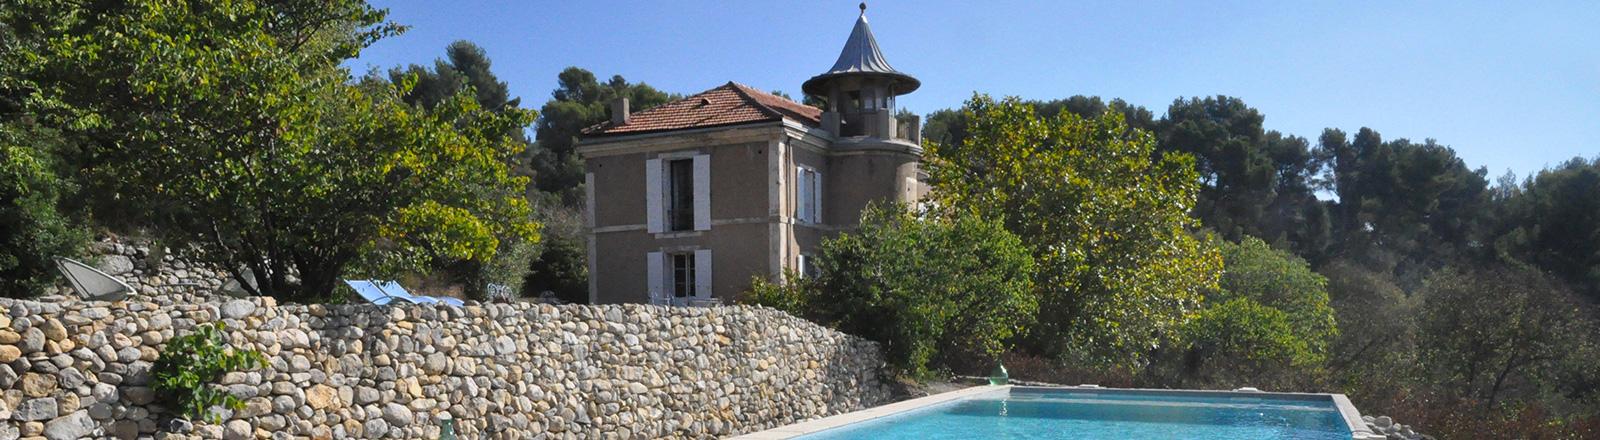 At The Swimming Pool. Bu0026B Beauregard Aix En Provence